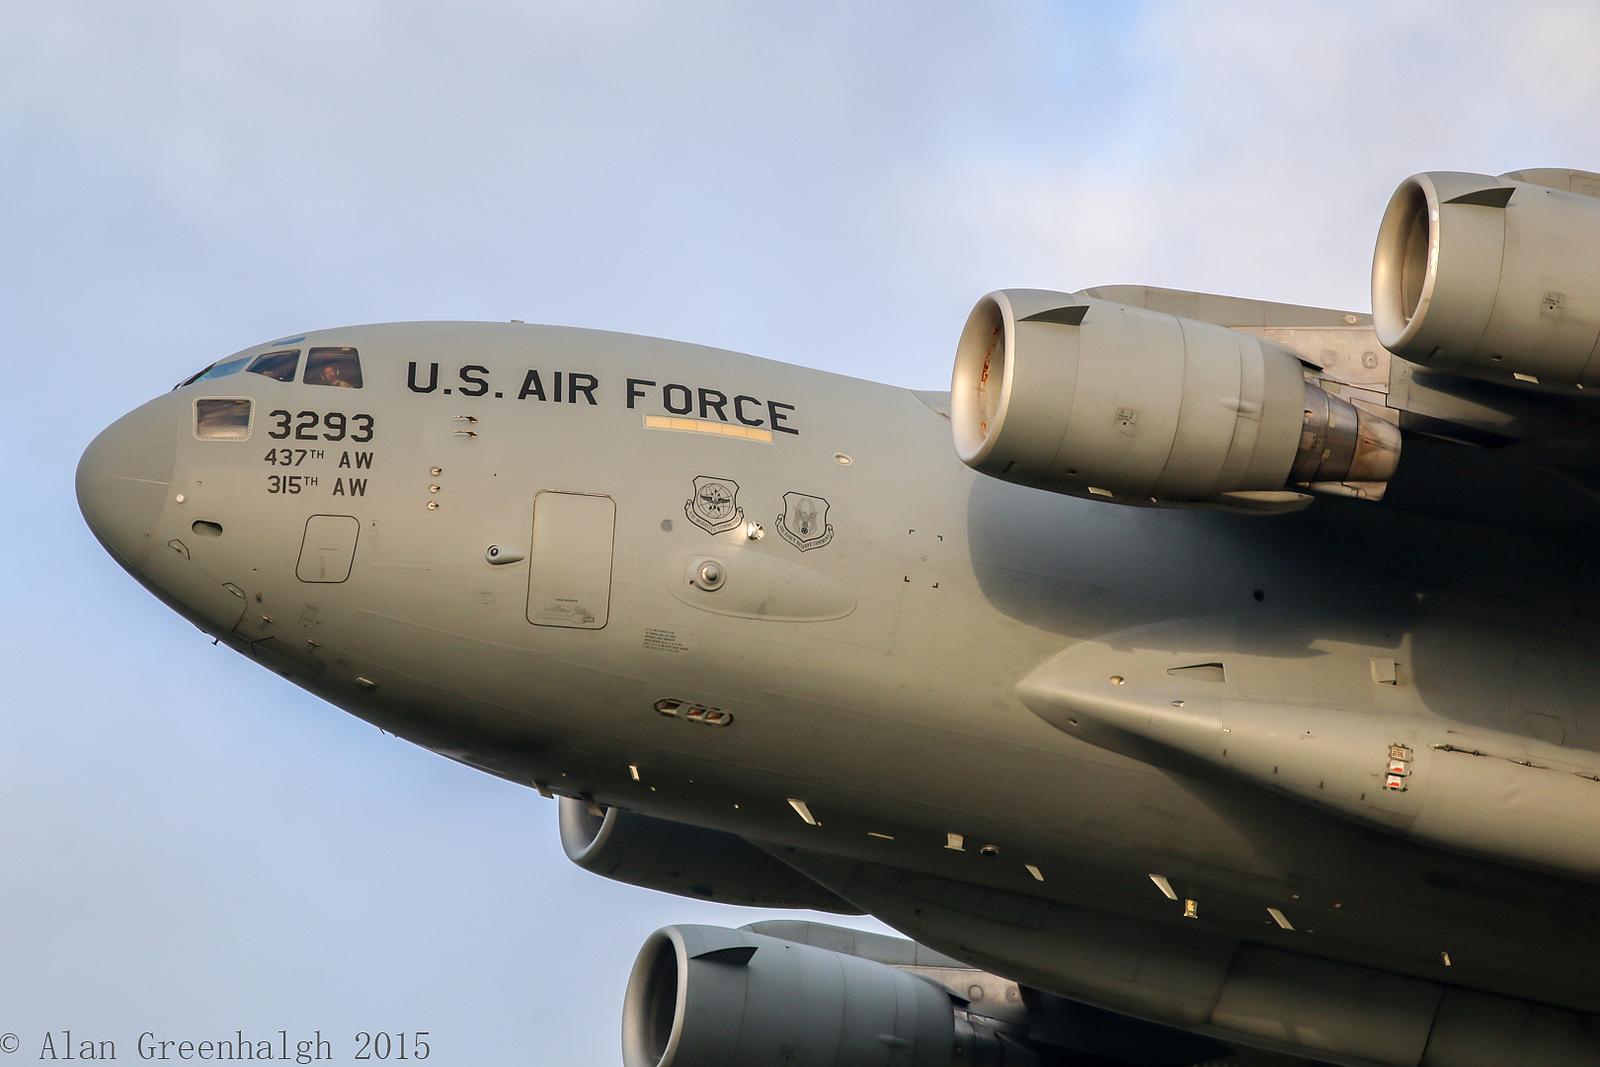 Boeing-C-A-Globemaster-III-USAF-wallpaper-wp5804148